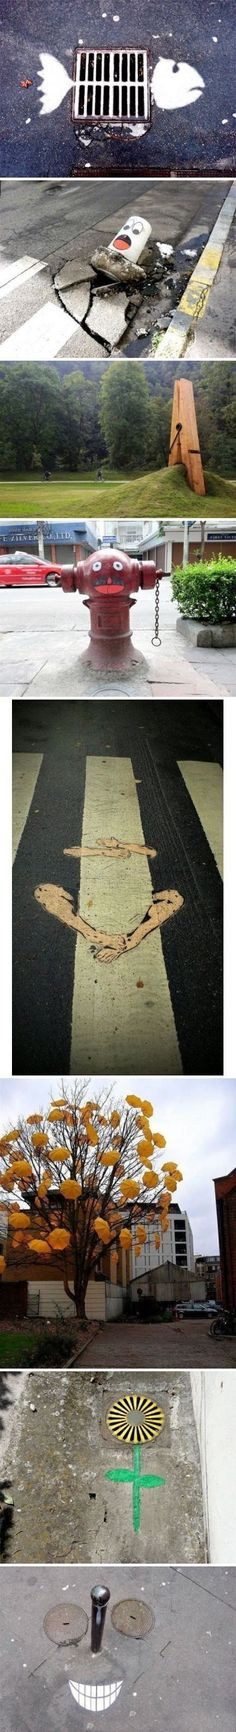 一组有趣的街头艺术